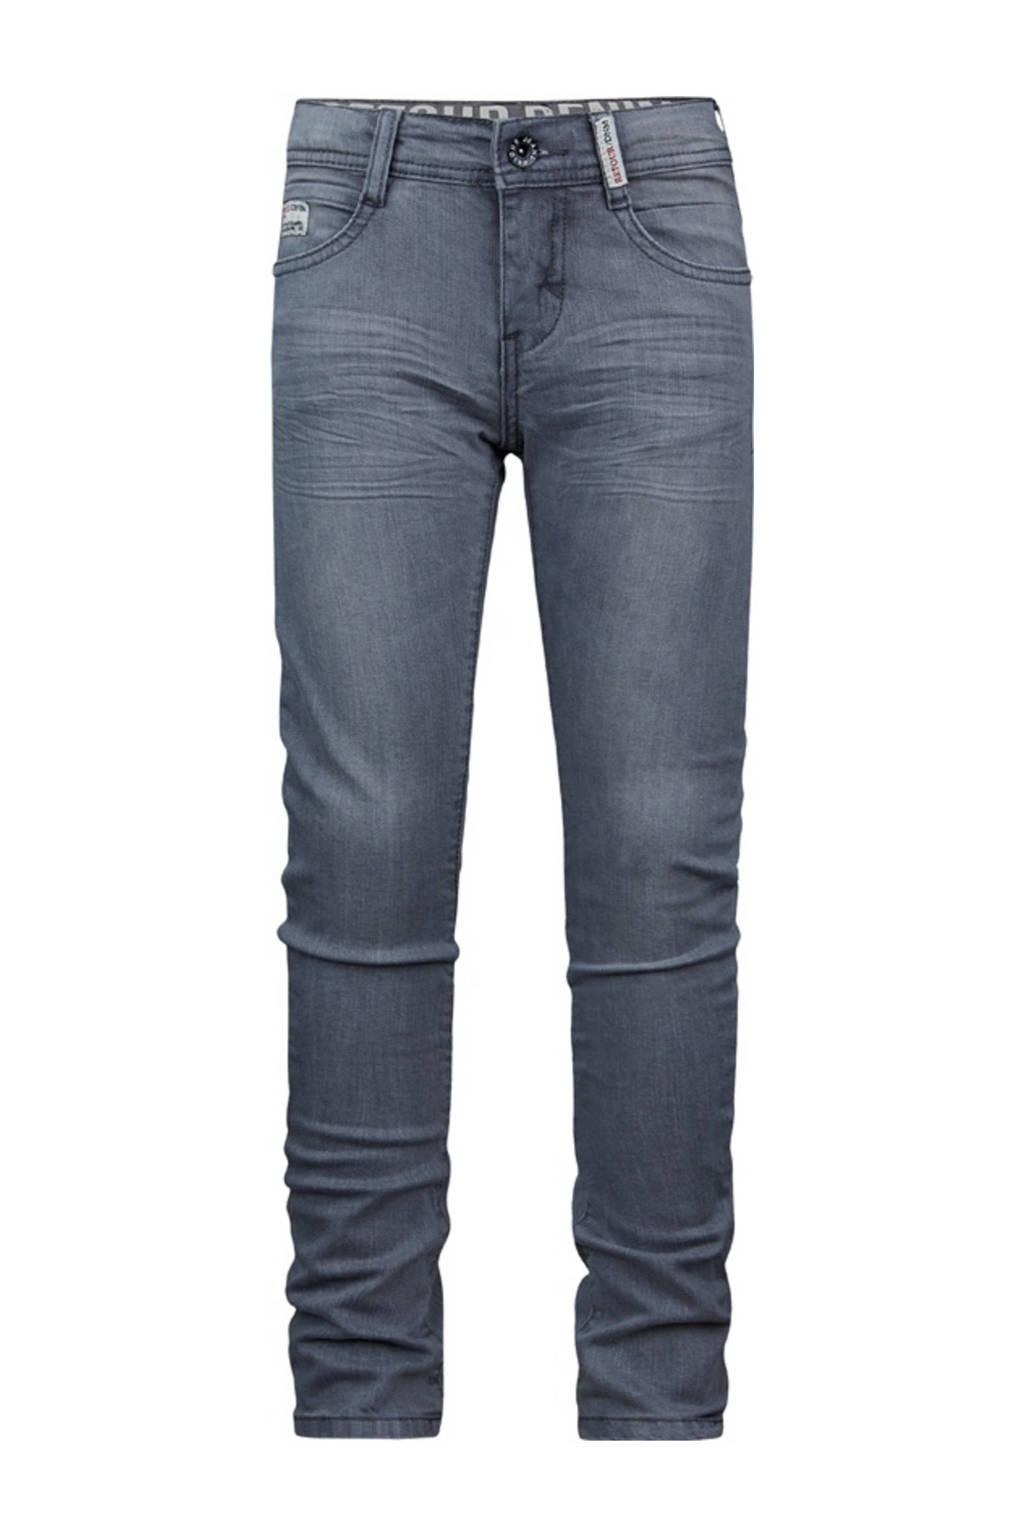 Retour Denim slim fit jeans Rover light grey denim, Light Grey Denim